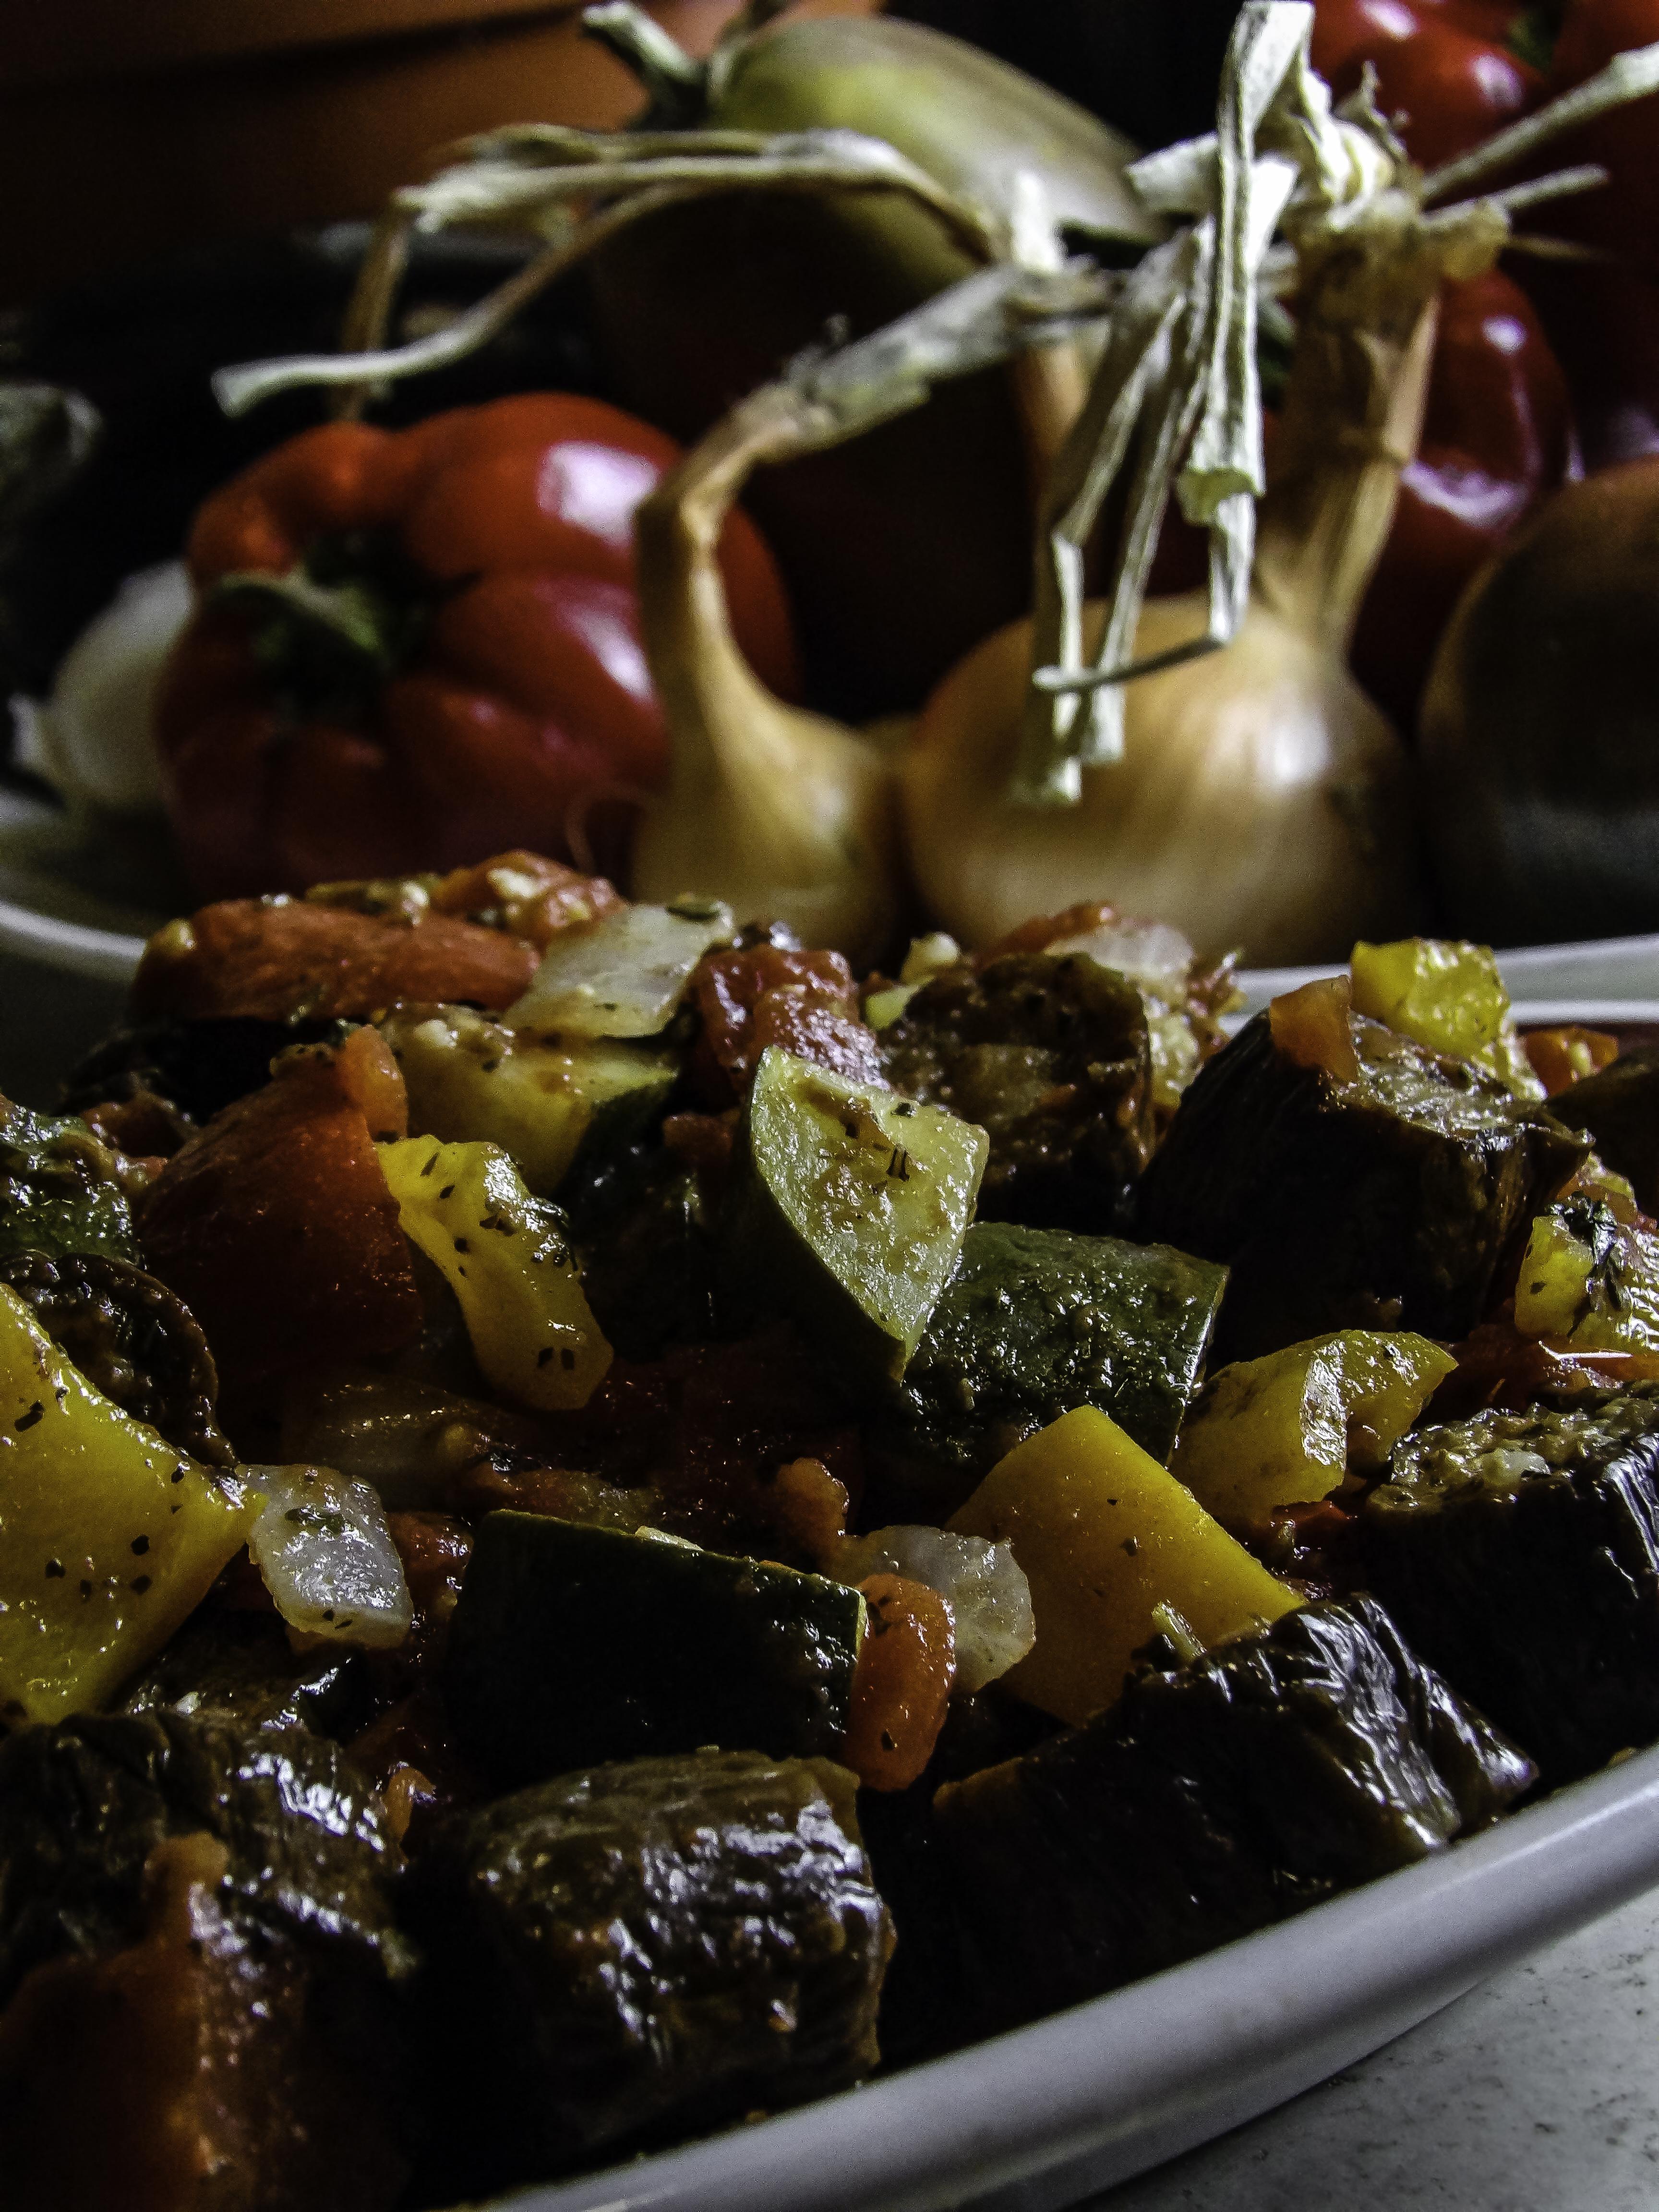 Rough-Cut Ratatouille Featuring Organic Heirloom Garden Veggies